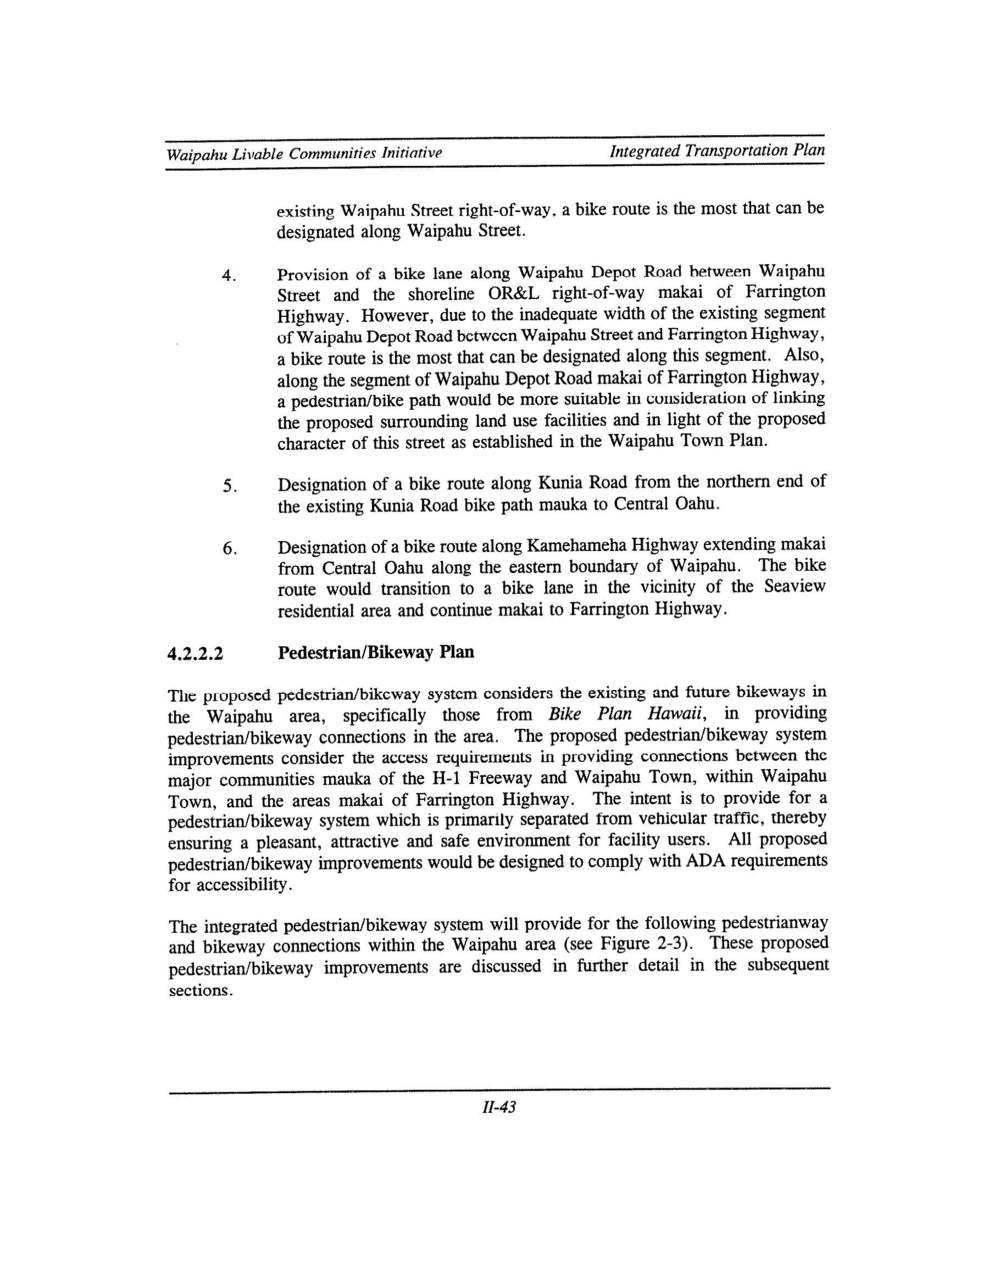 160531_WaipahuLivableCommunities(1998)_Page_058.jpg